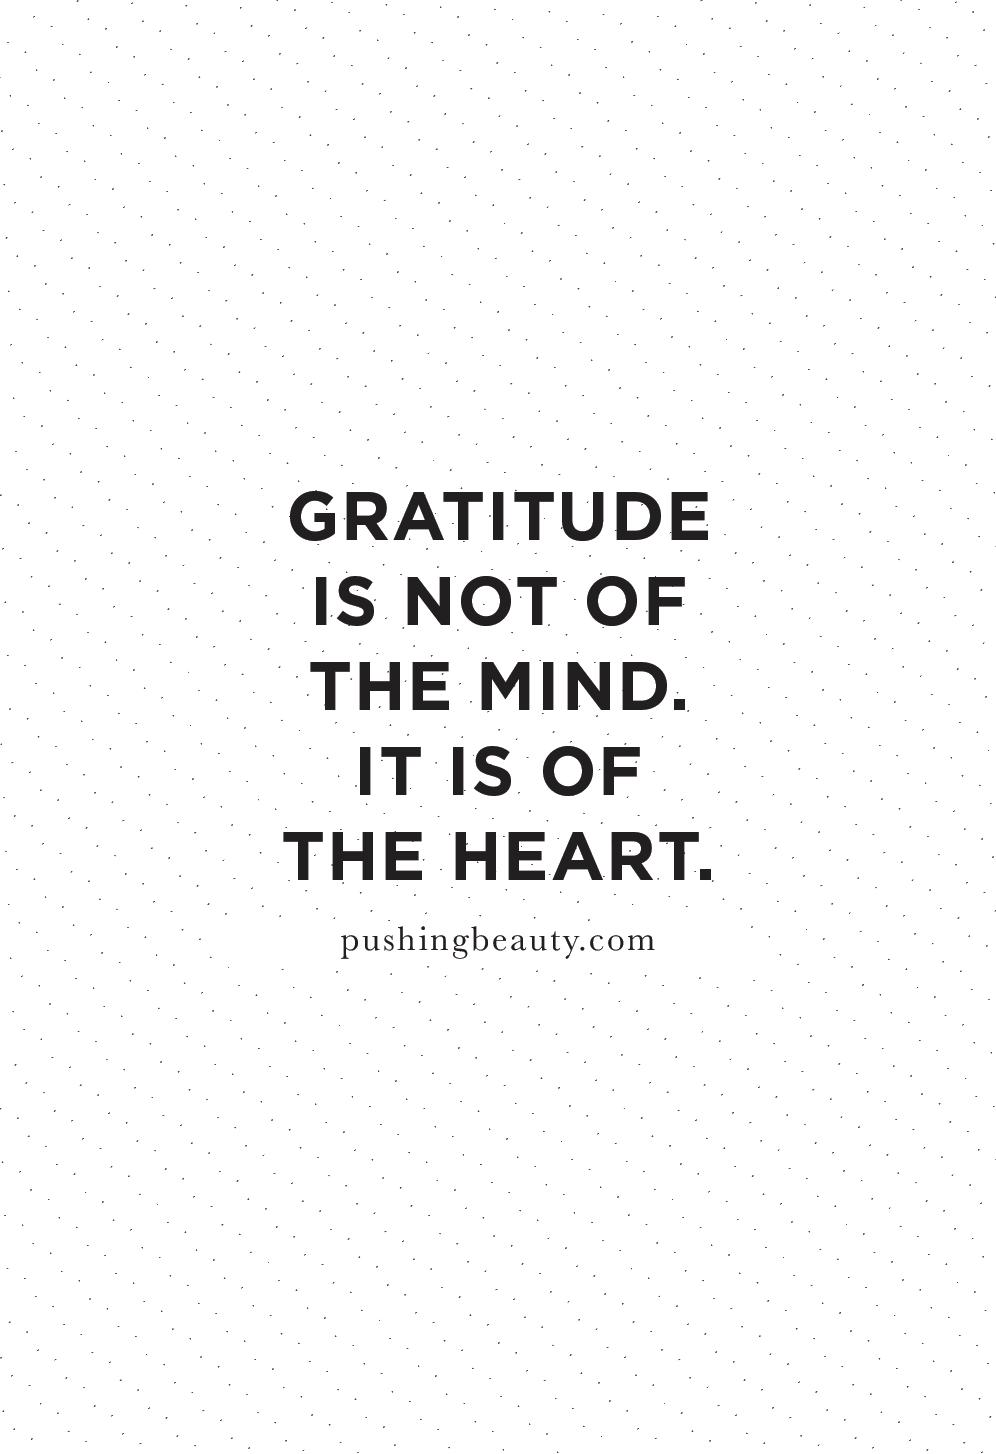 gratitude quotes | pushing beauty